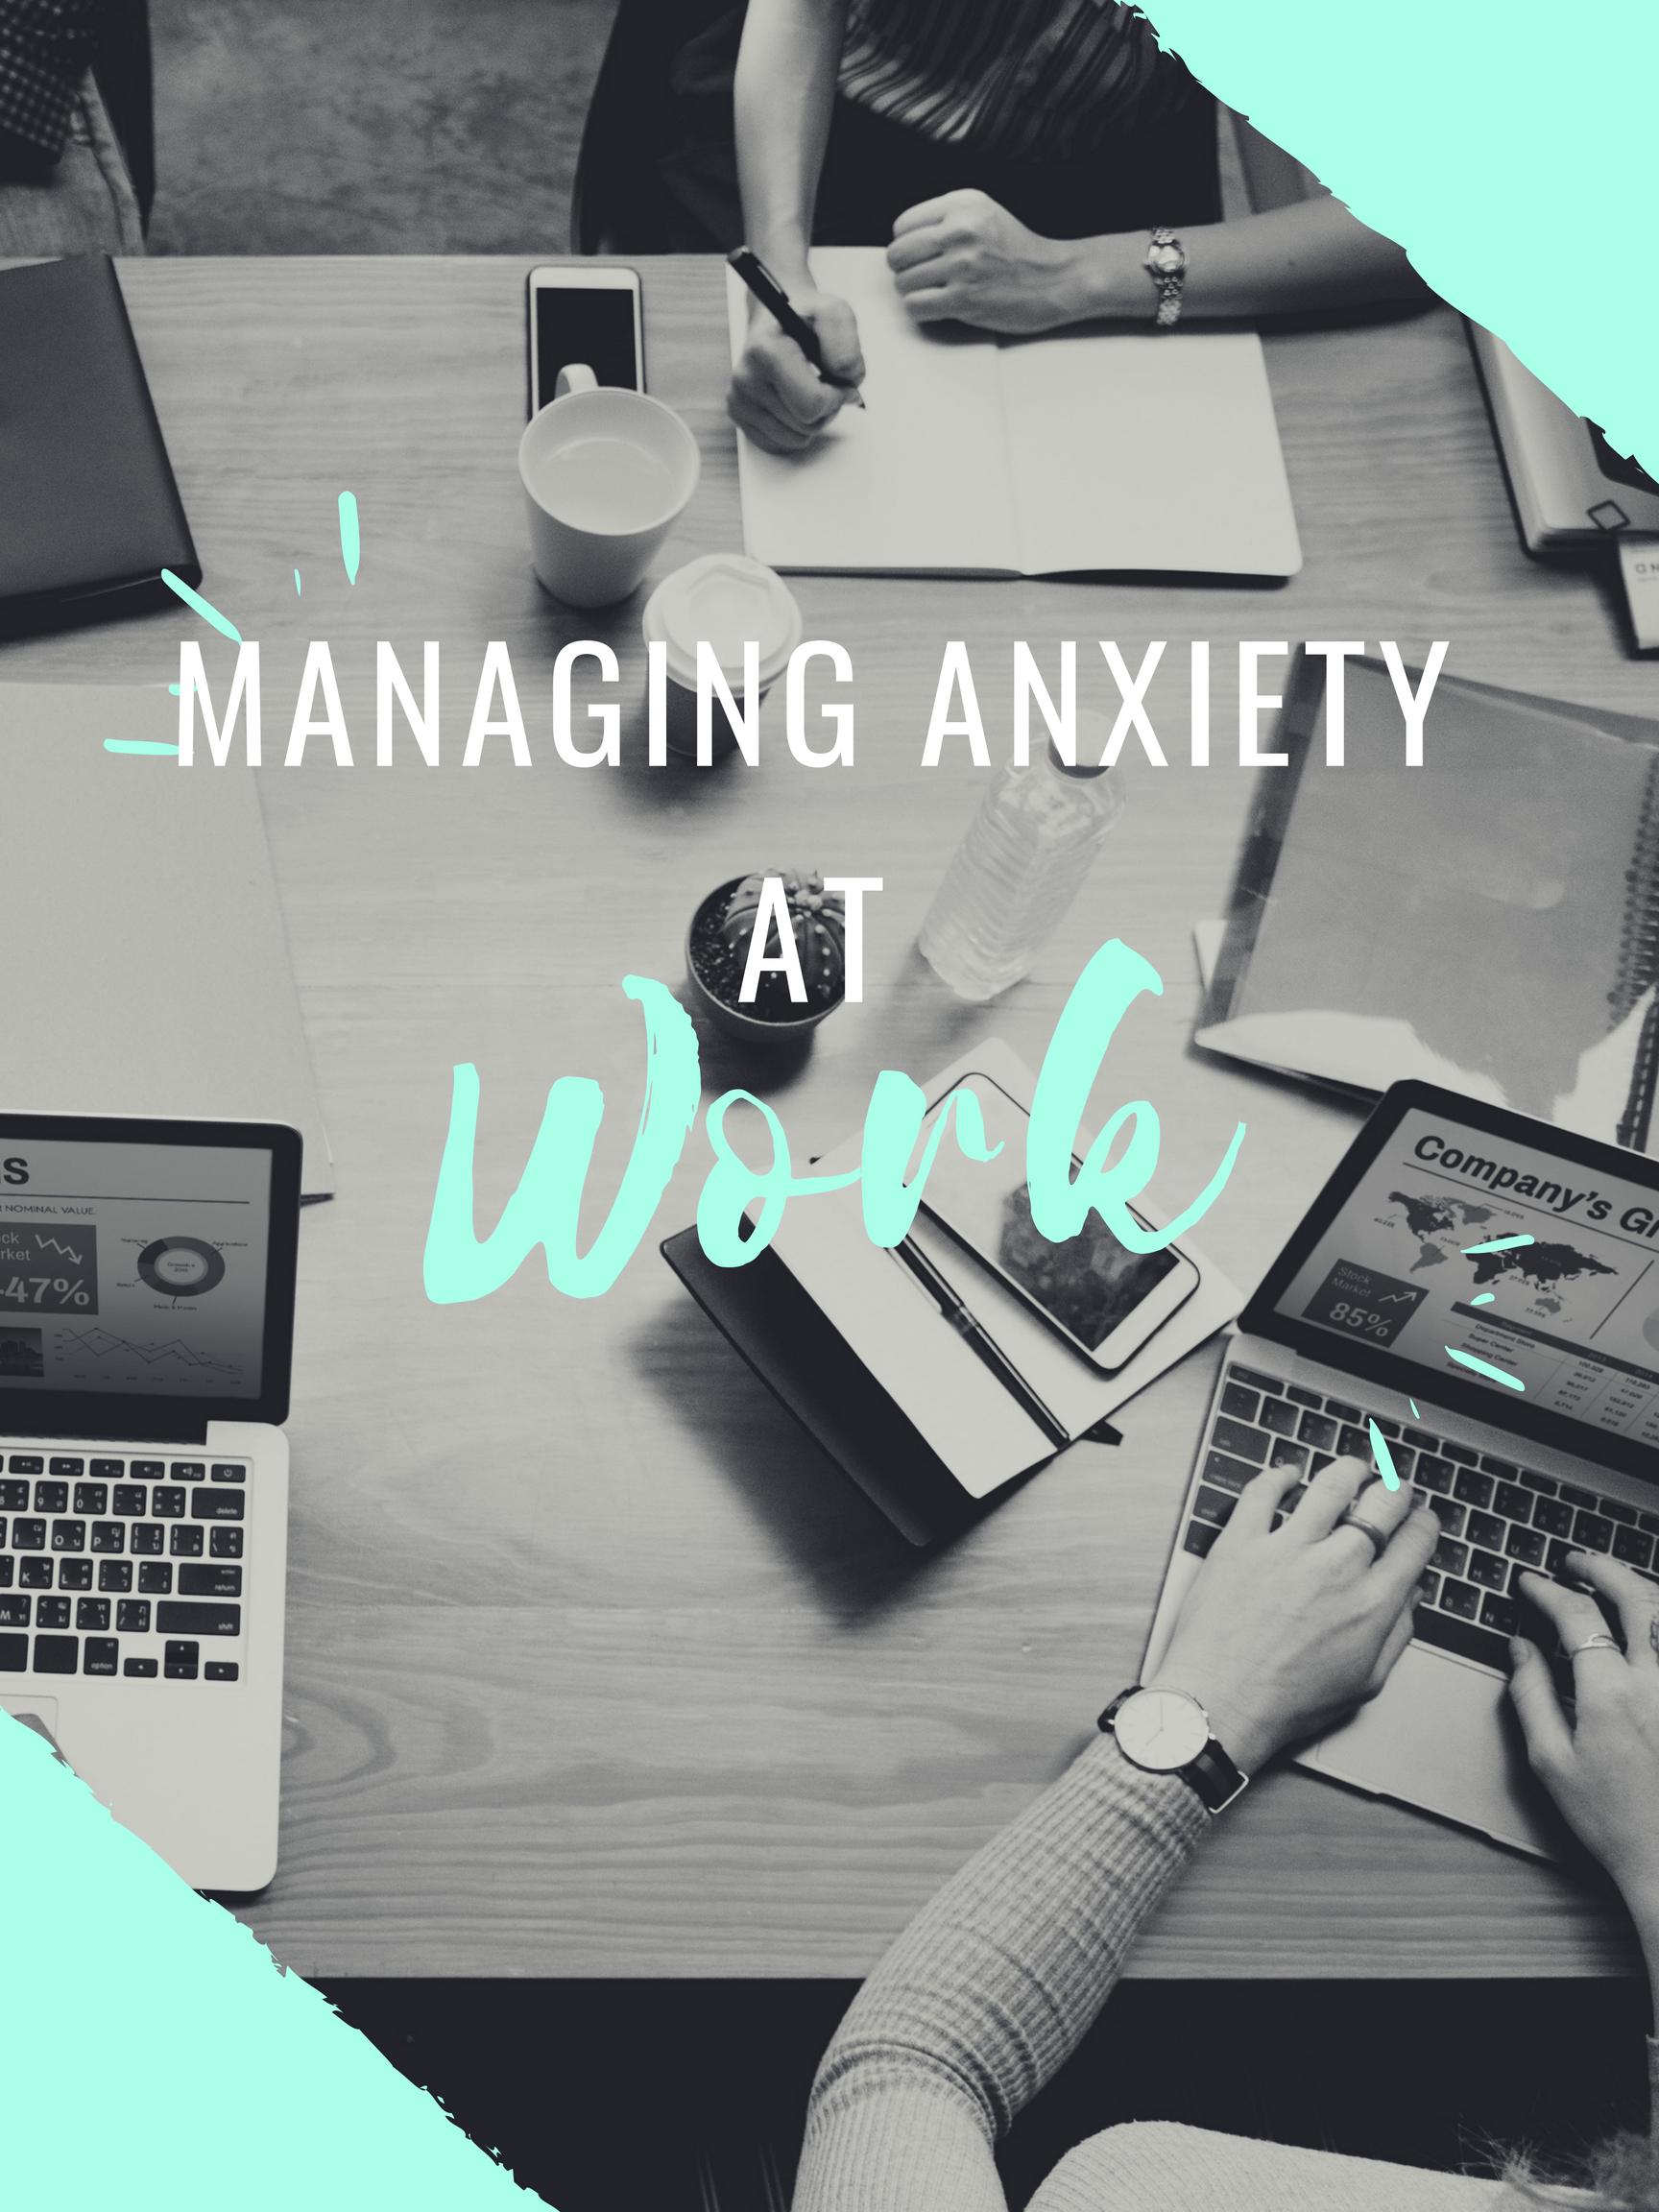 managing anxiety at work.jpg